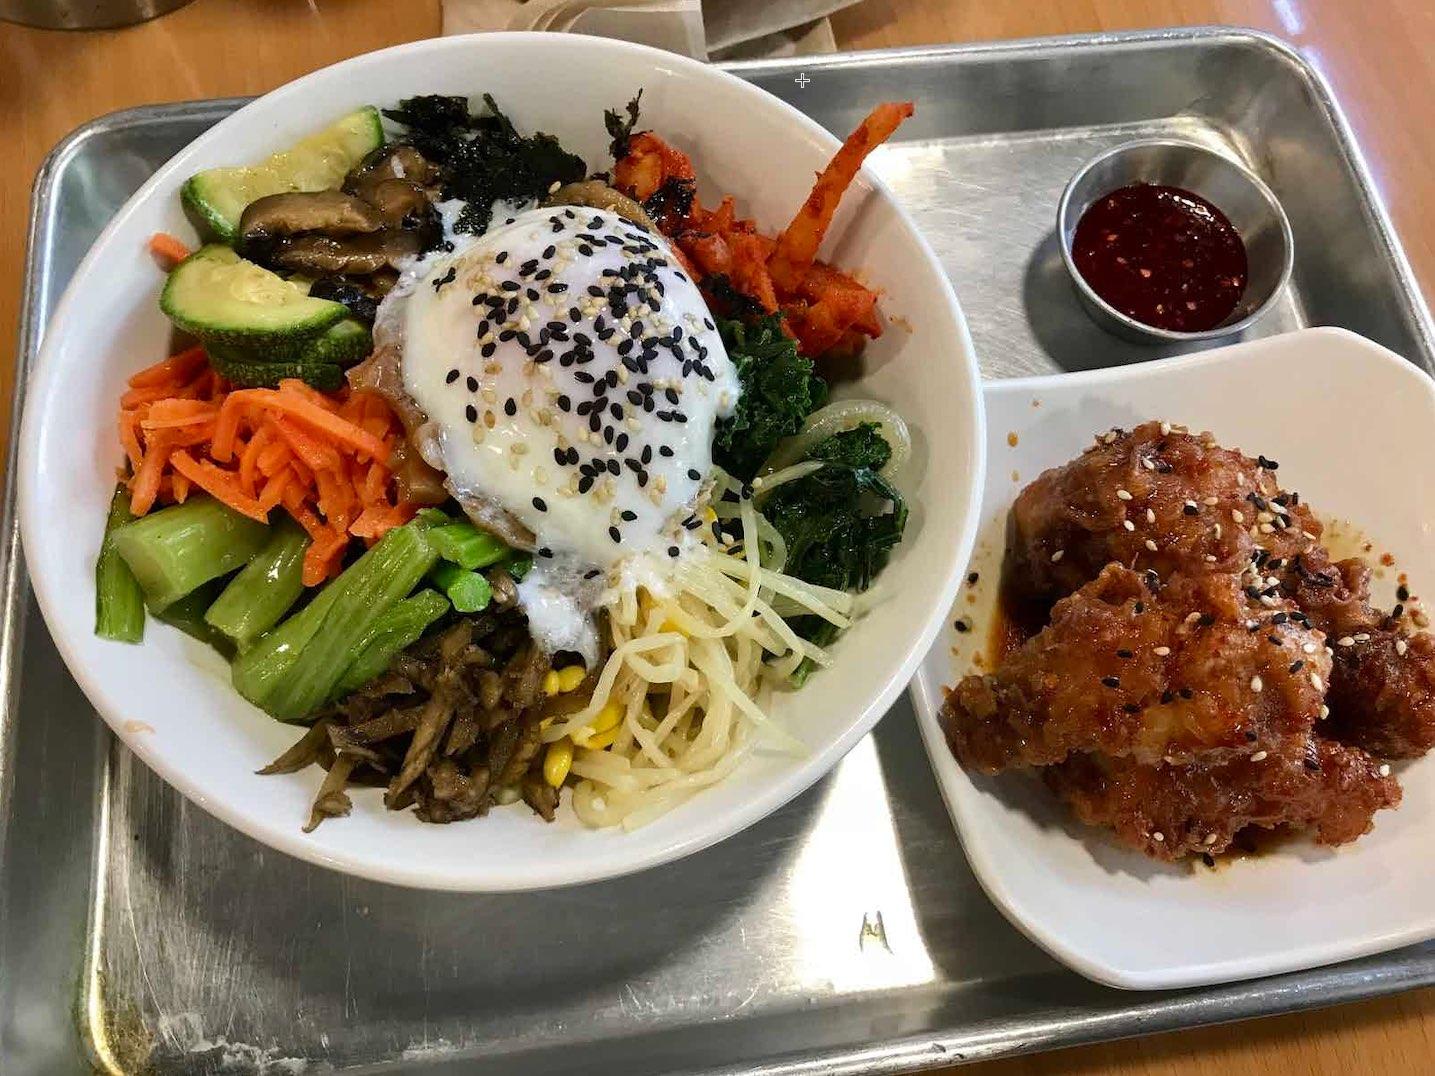 EkoEats, a Korean-Inspired Cafe Serving Up Delicious Vegan Ramen in DTLA